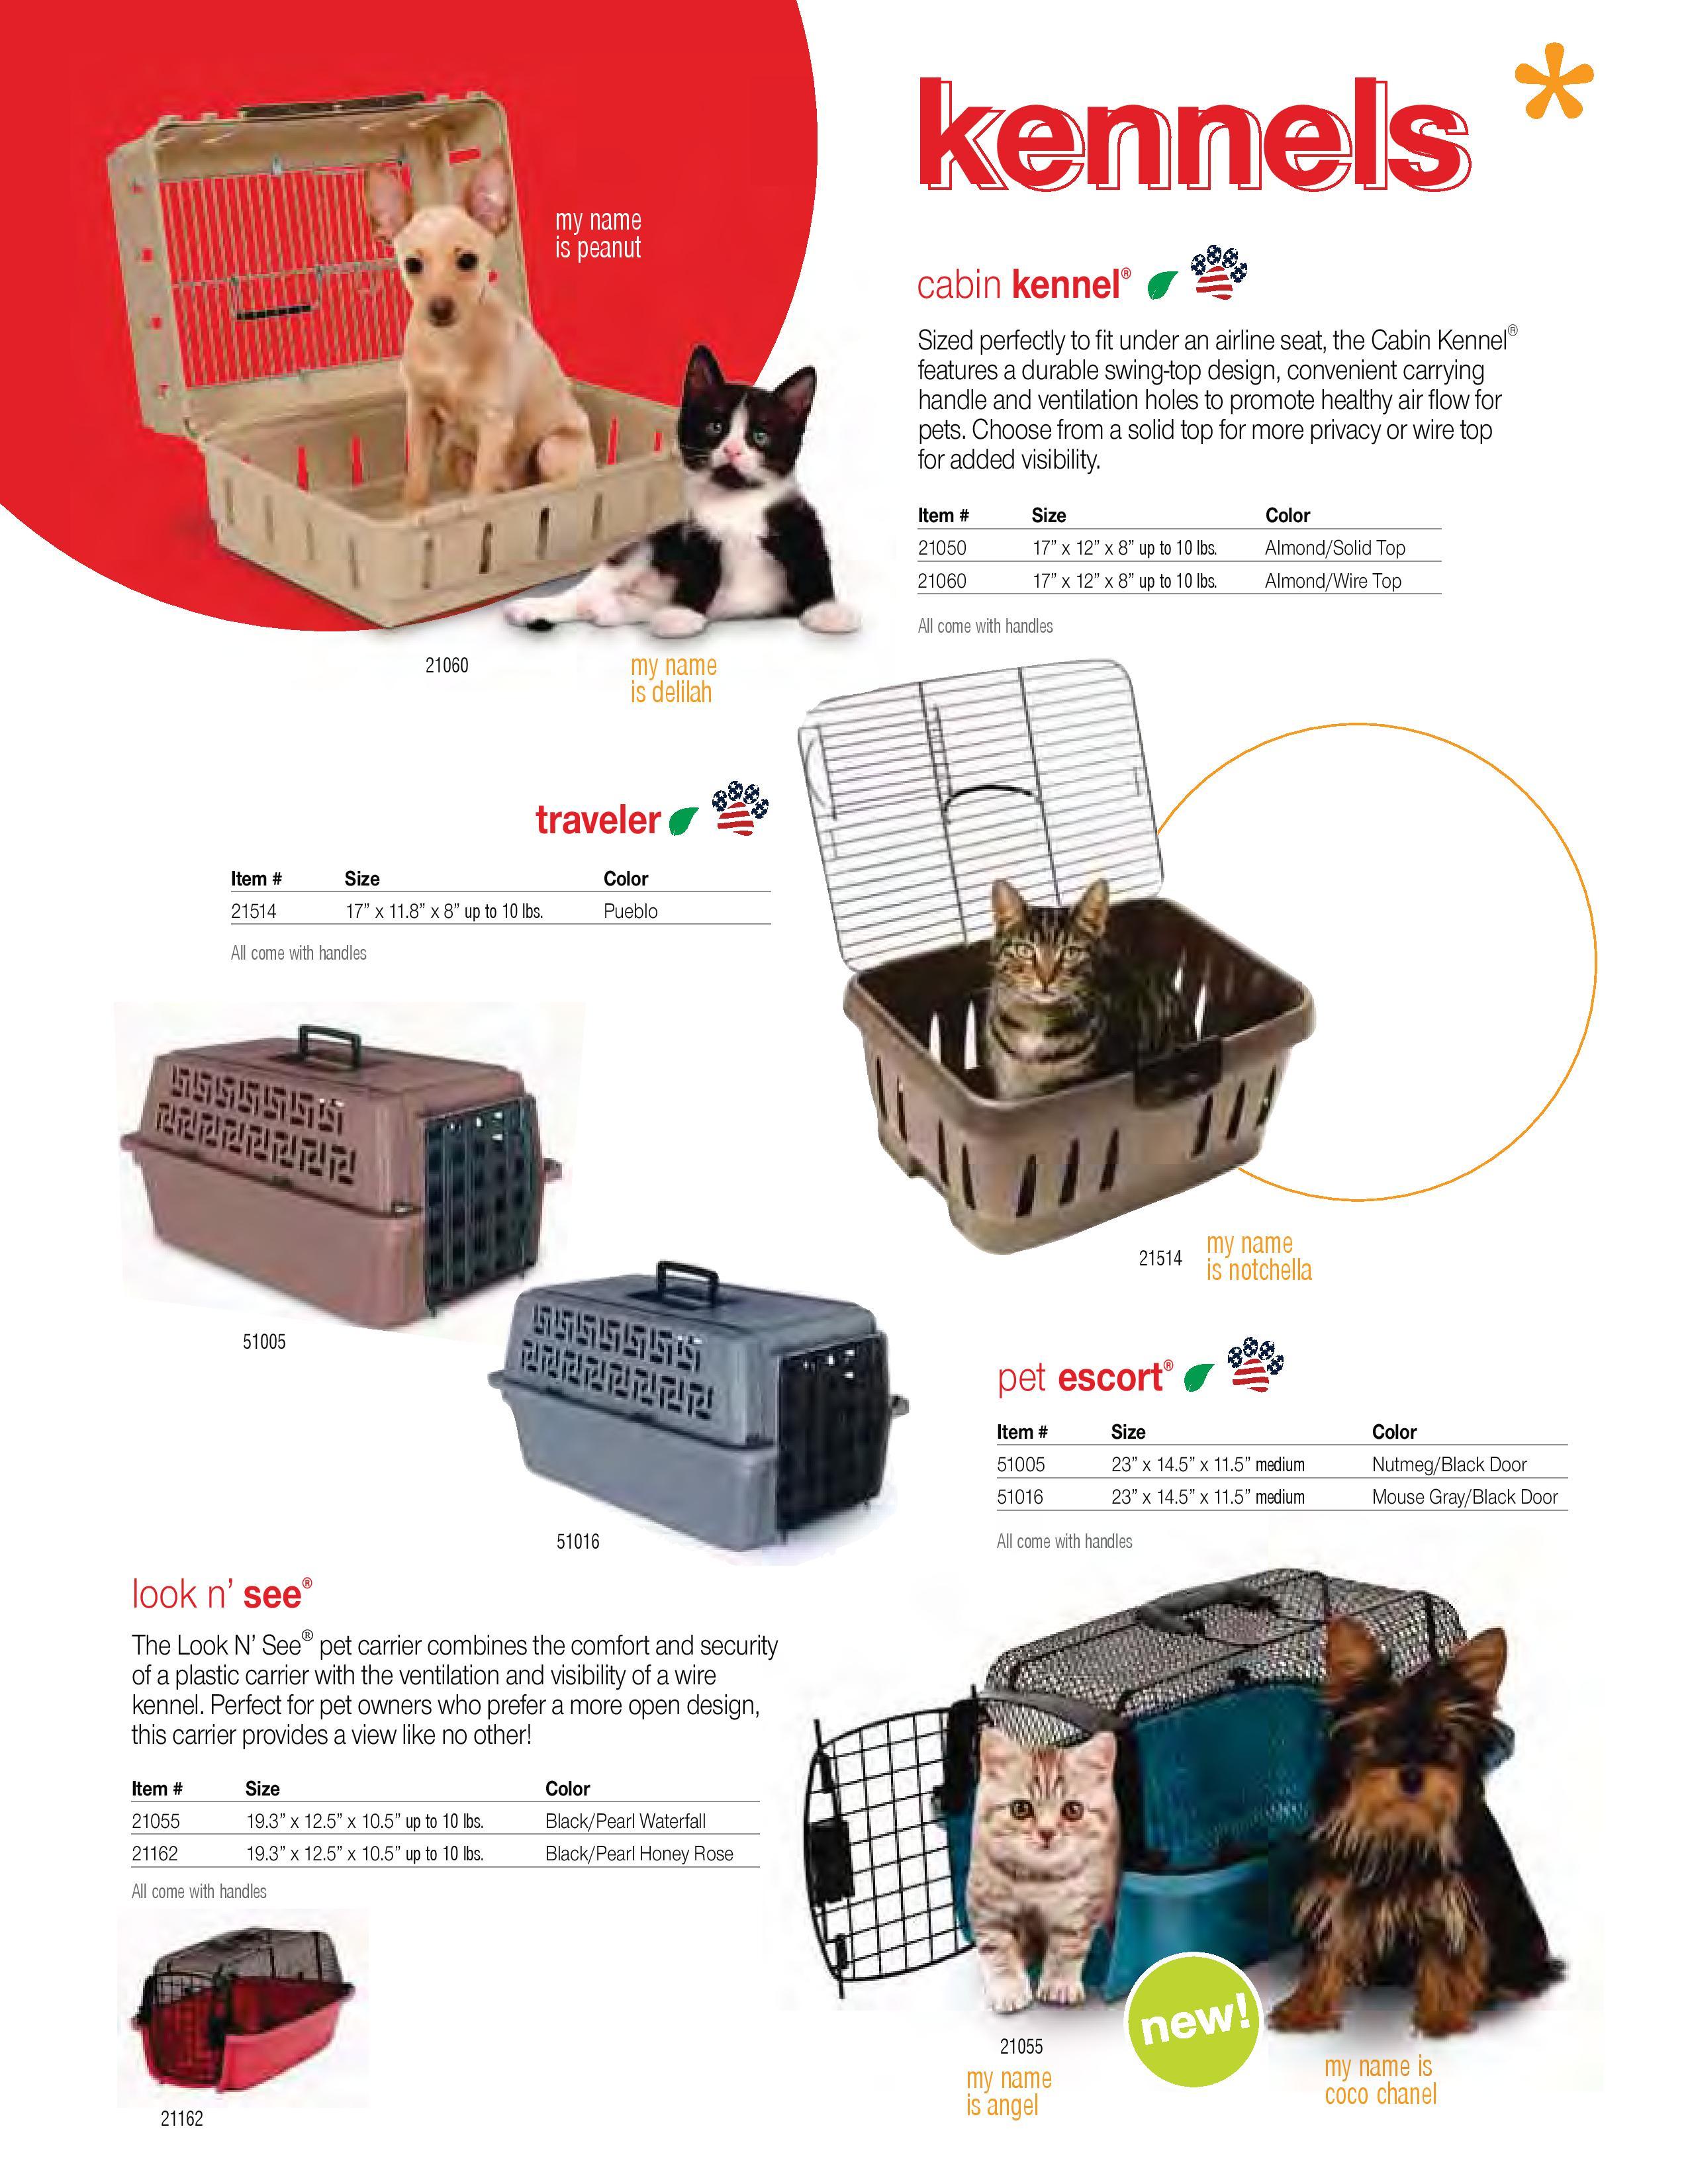 Emirtaes Animals Export 1 (16)